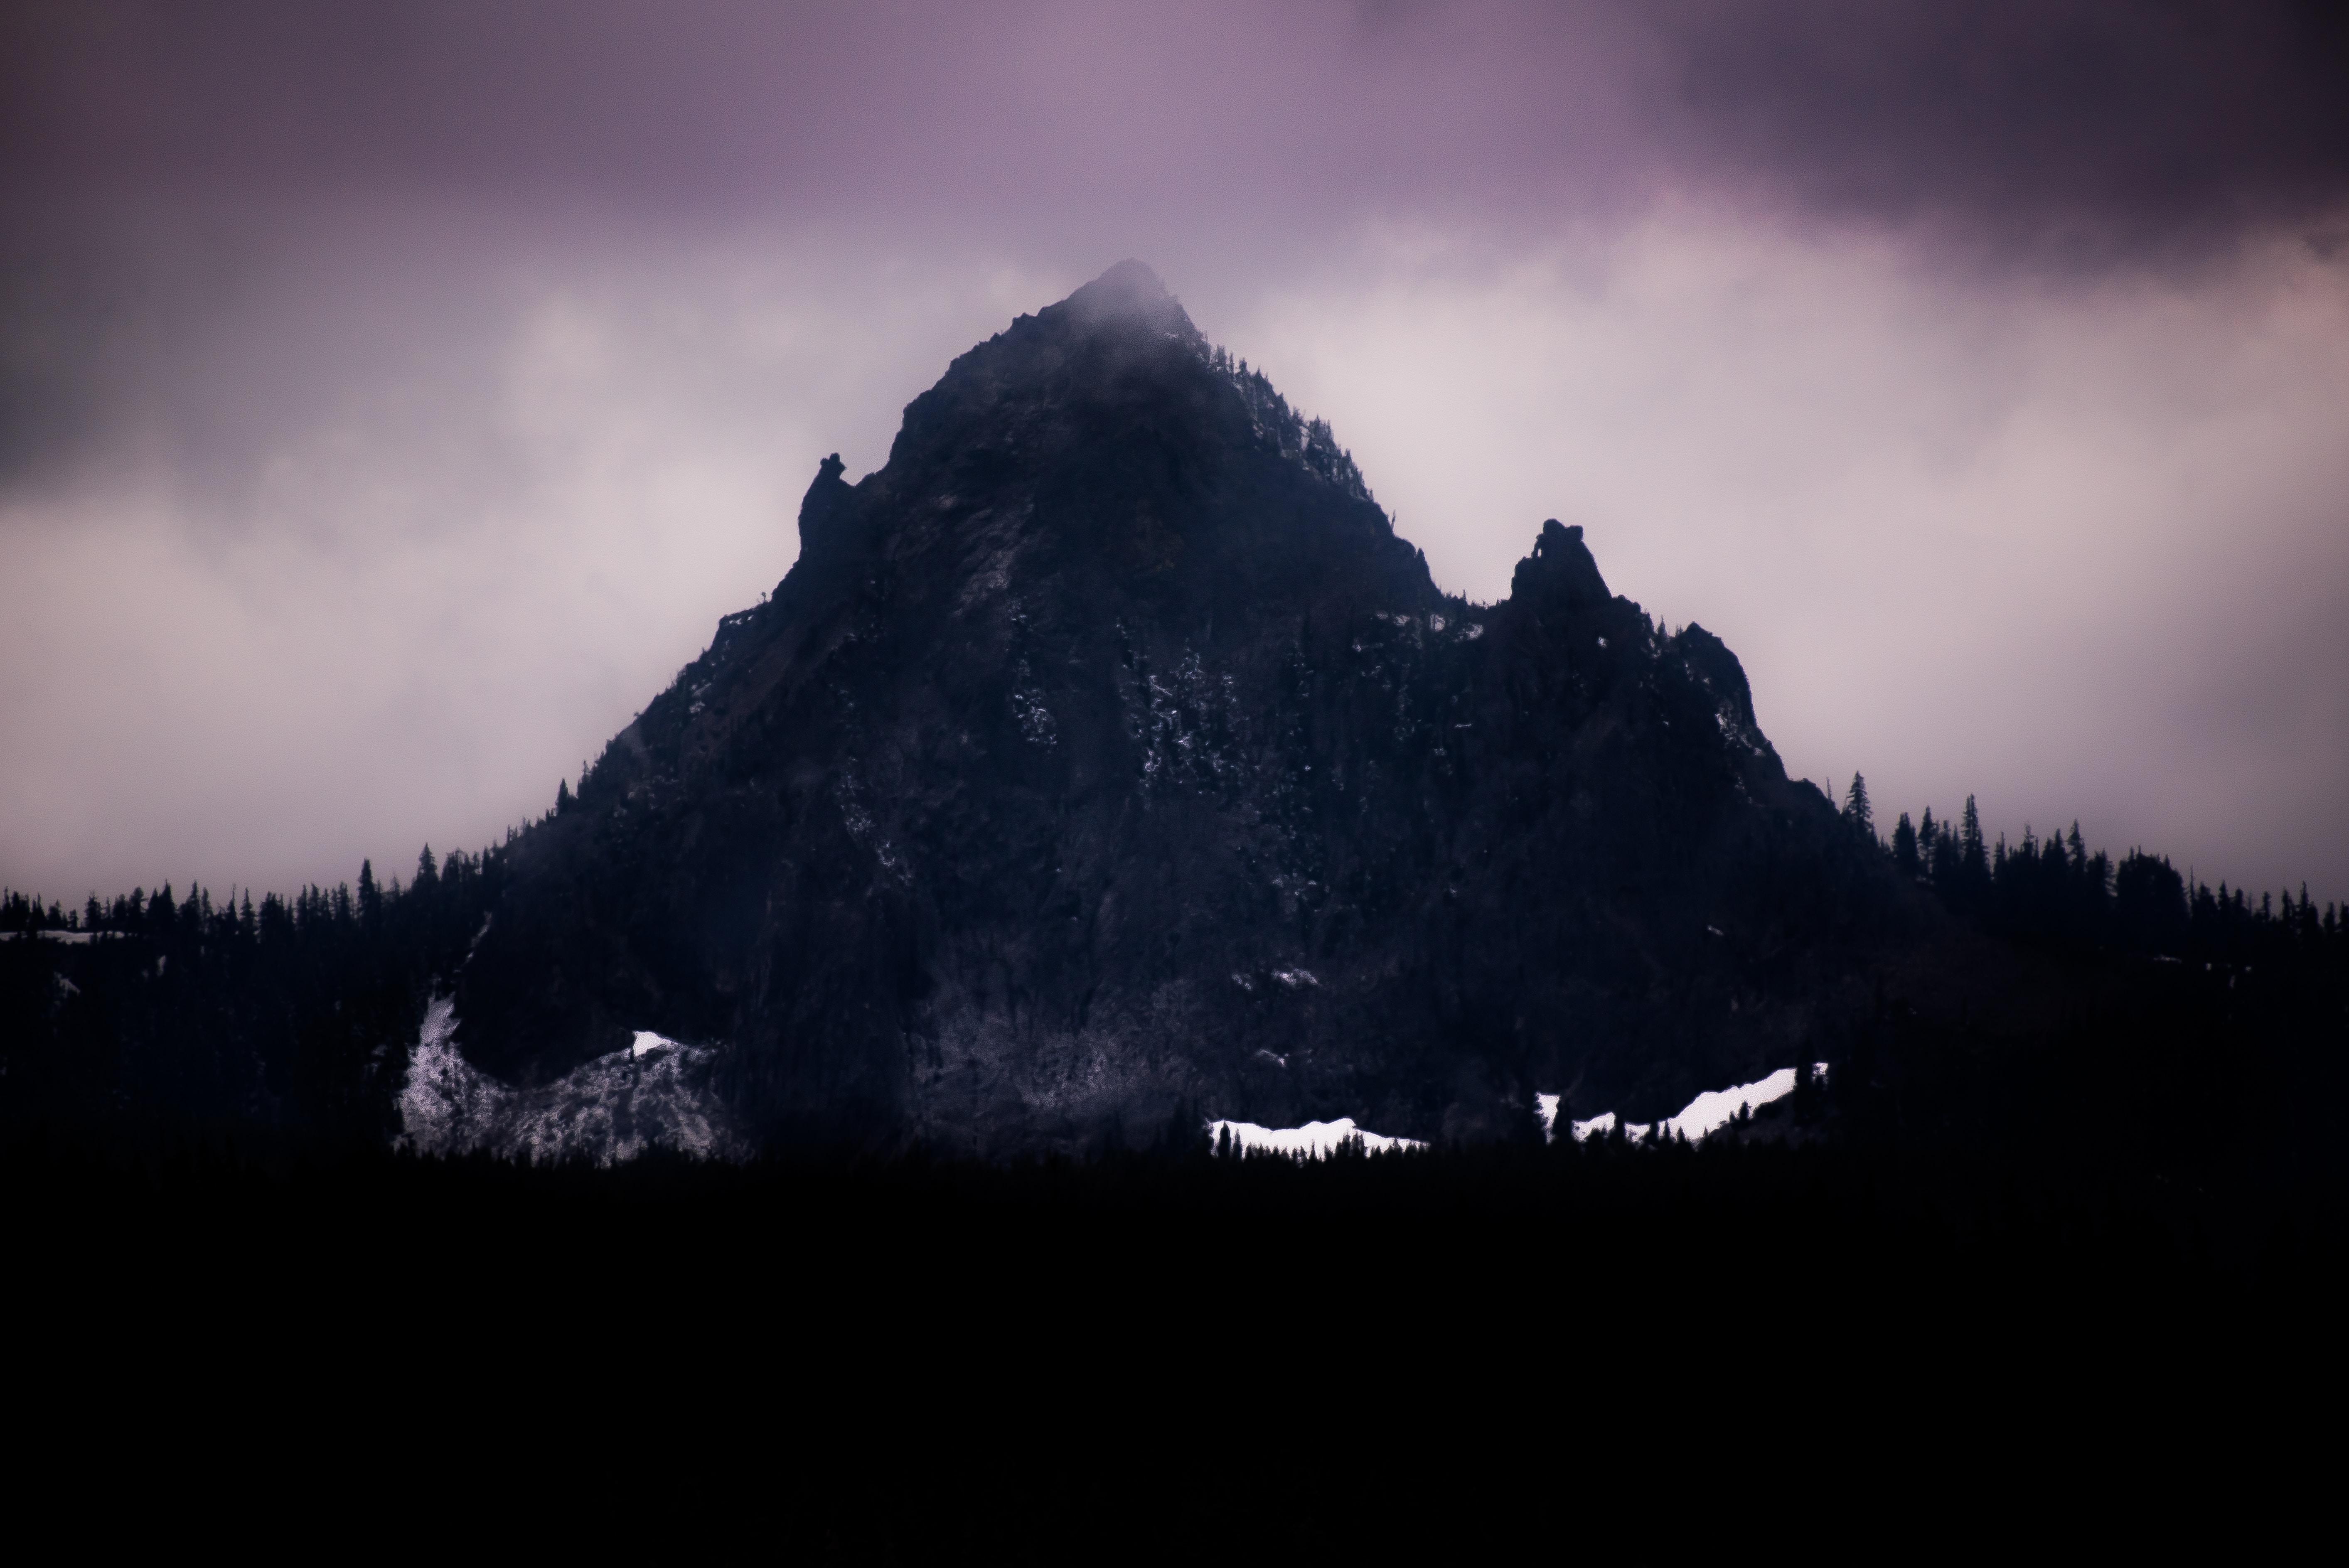 gray mountain at nighttime